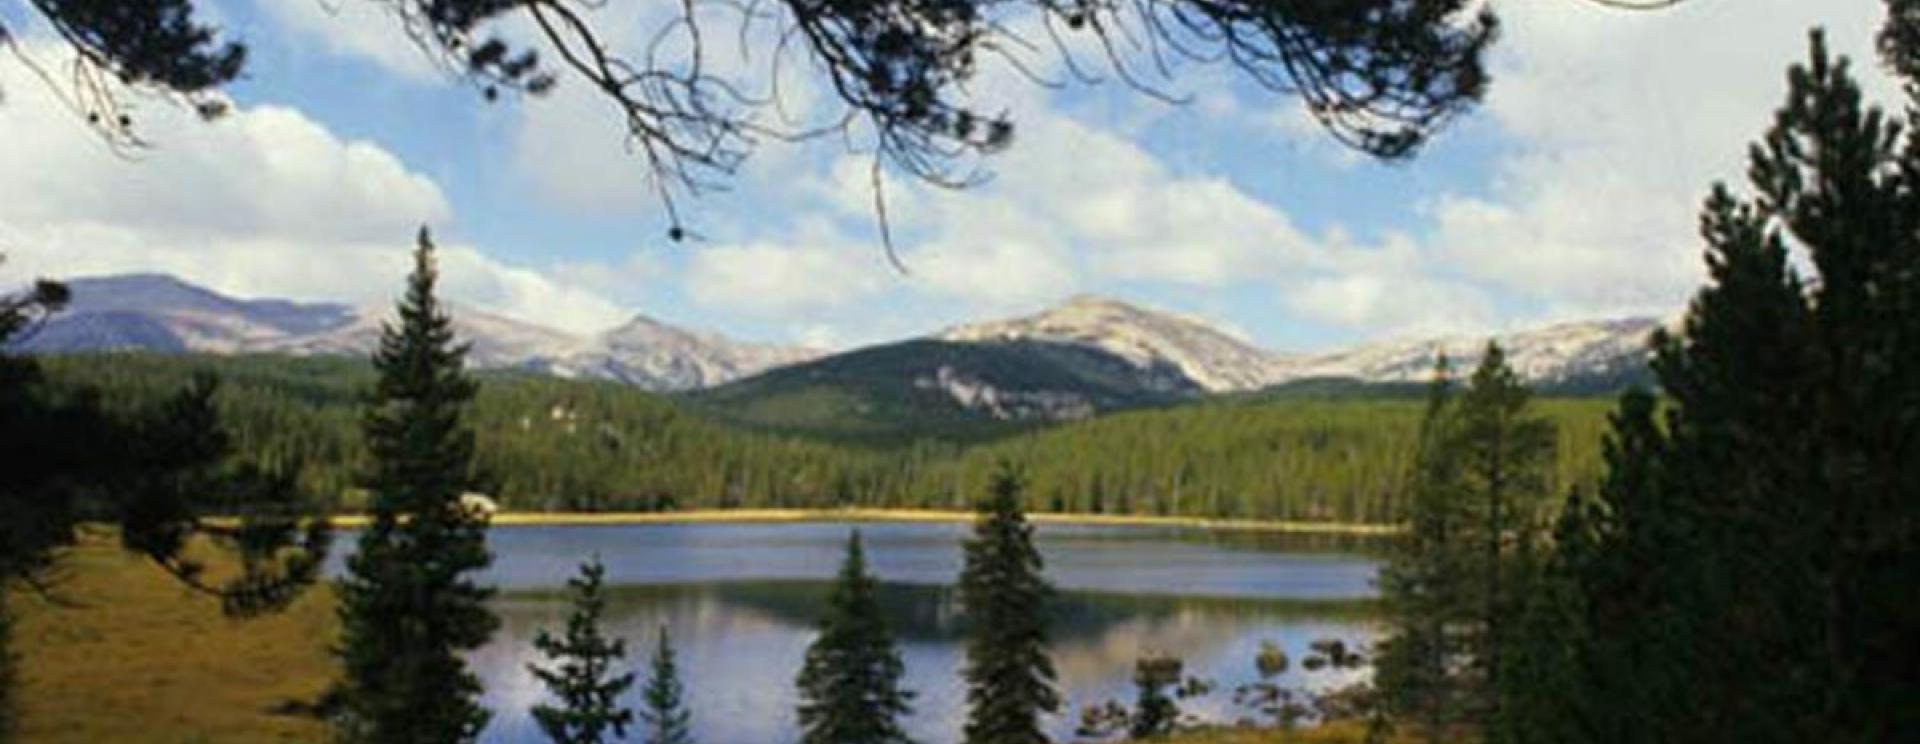 Moorcroft, Wyoming